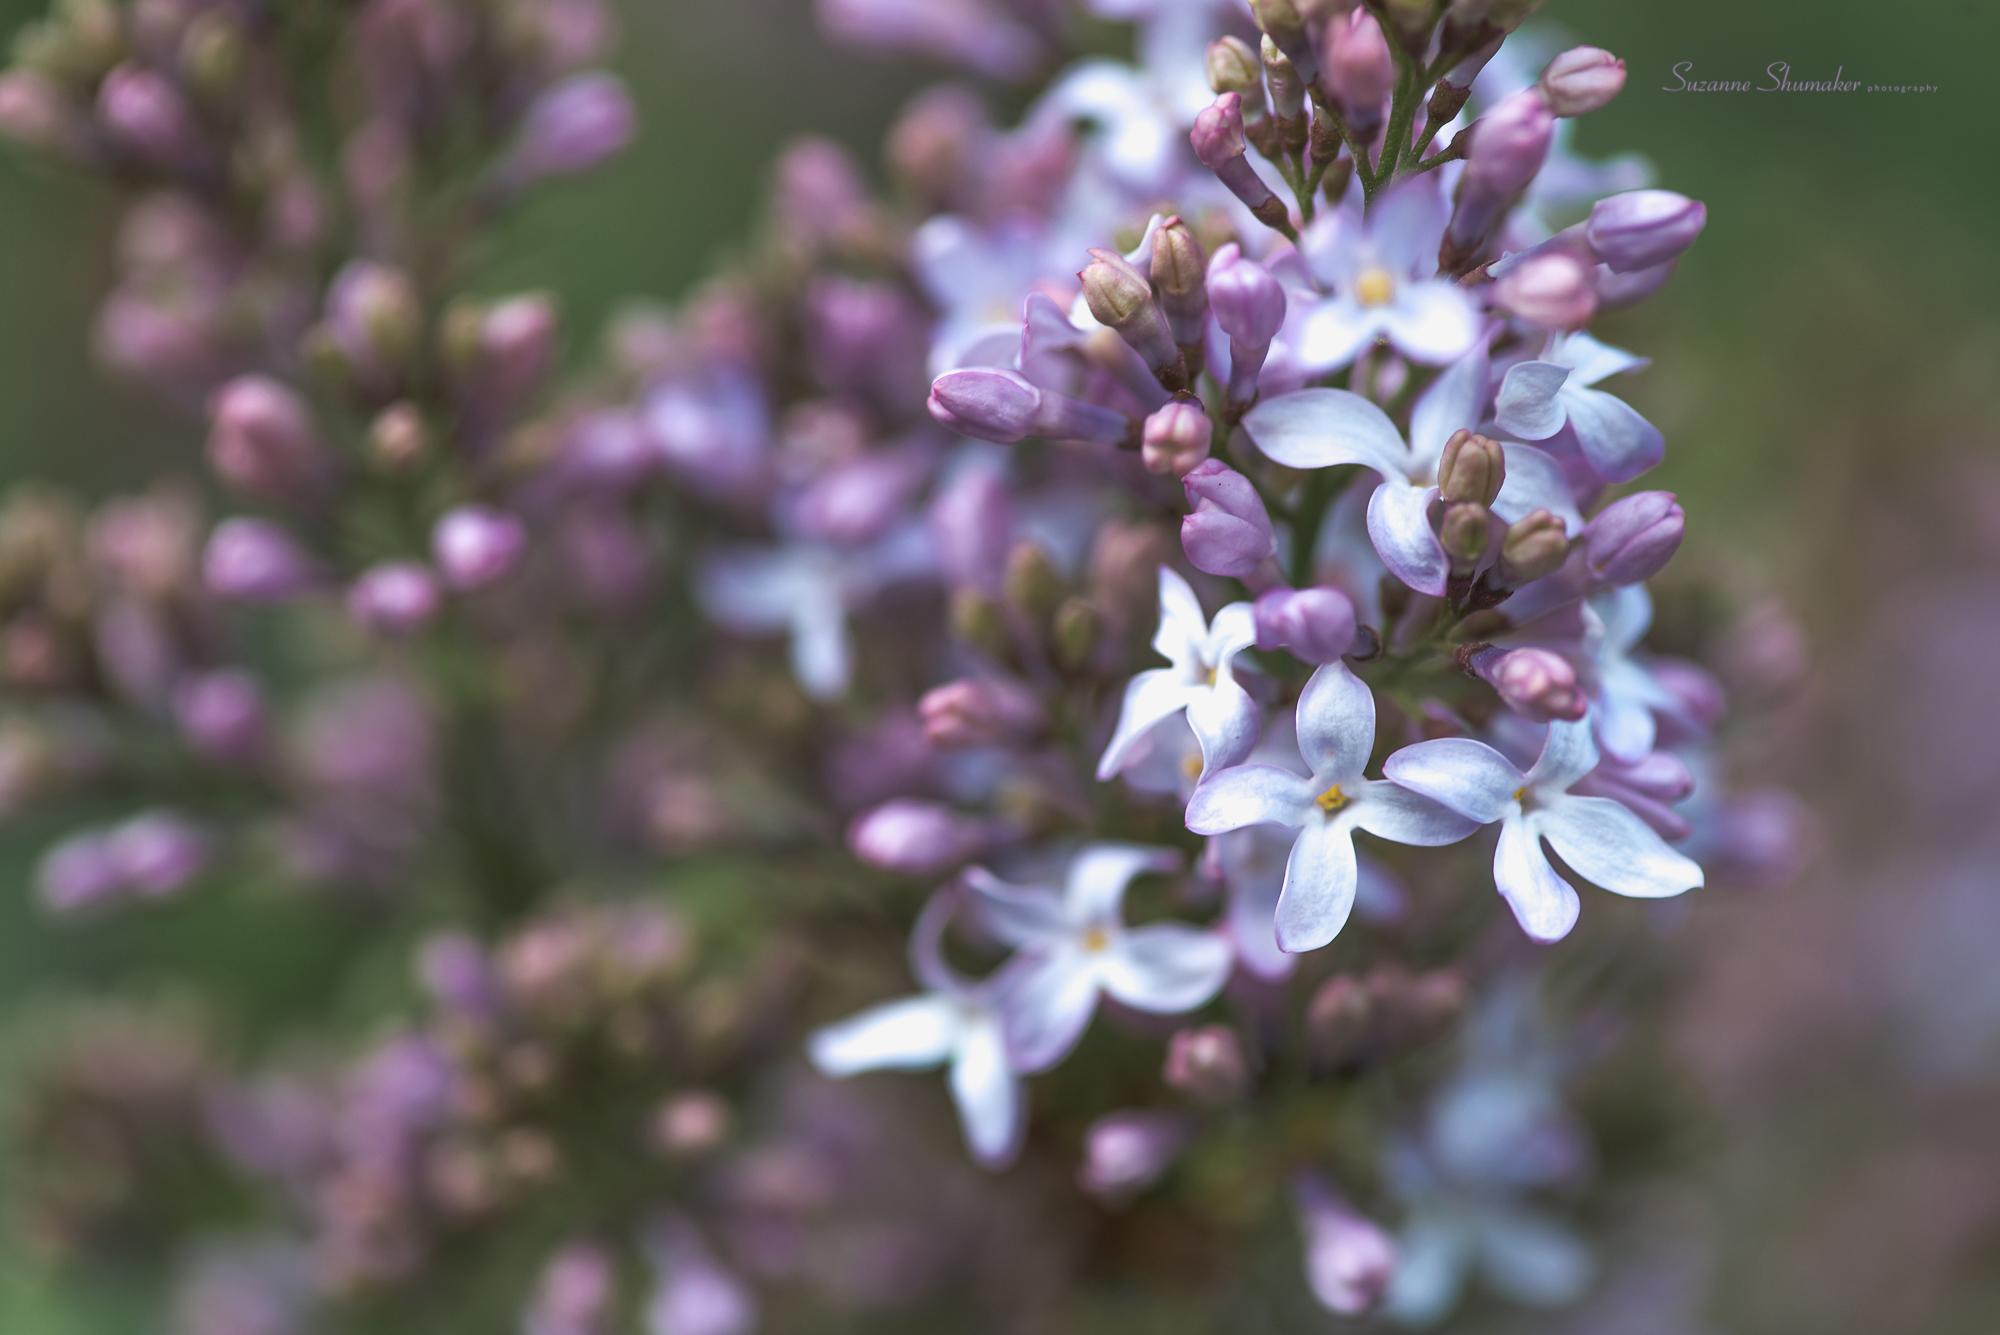 lilacsss.jpg